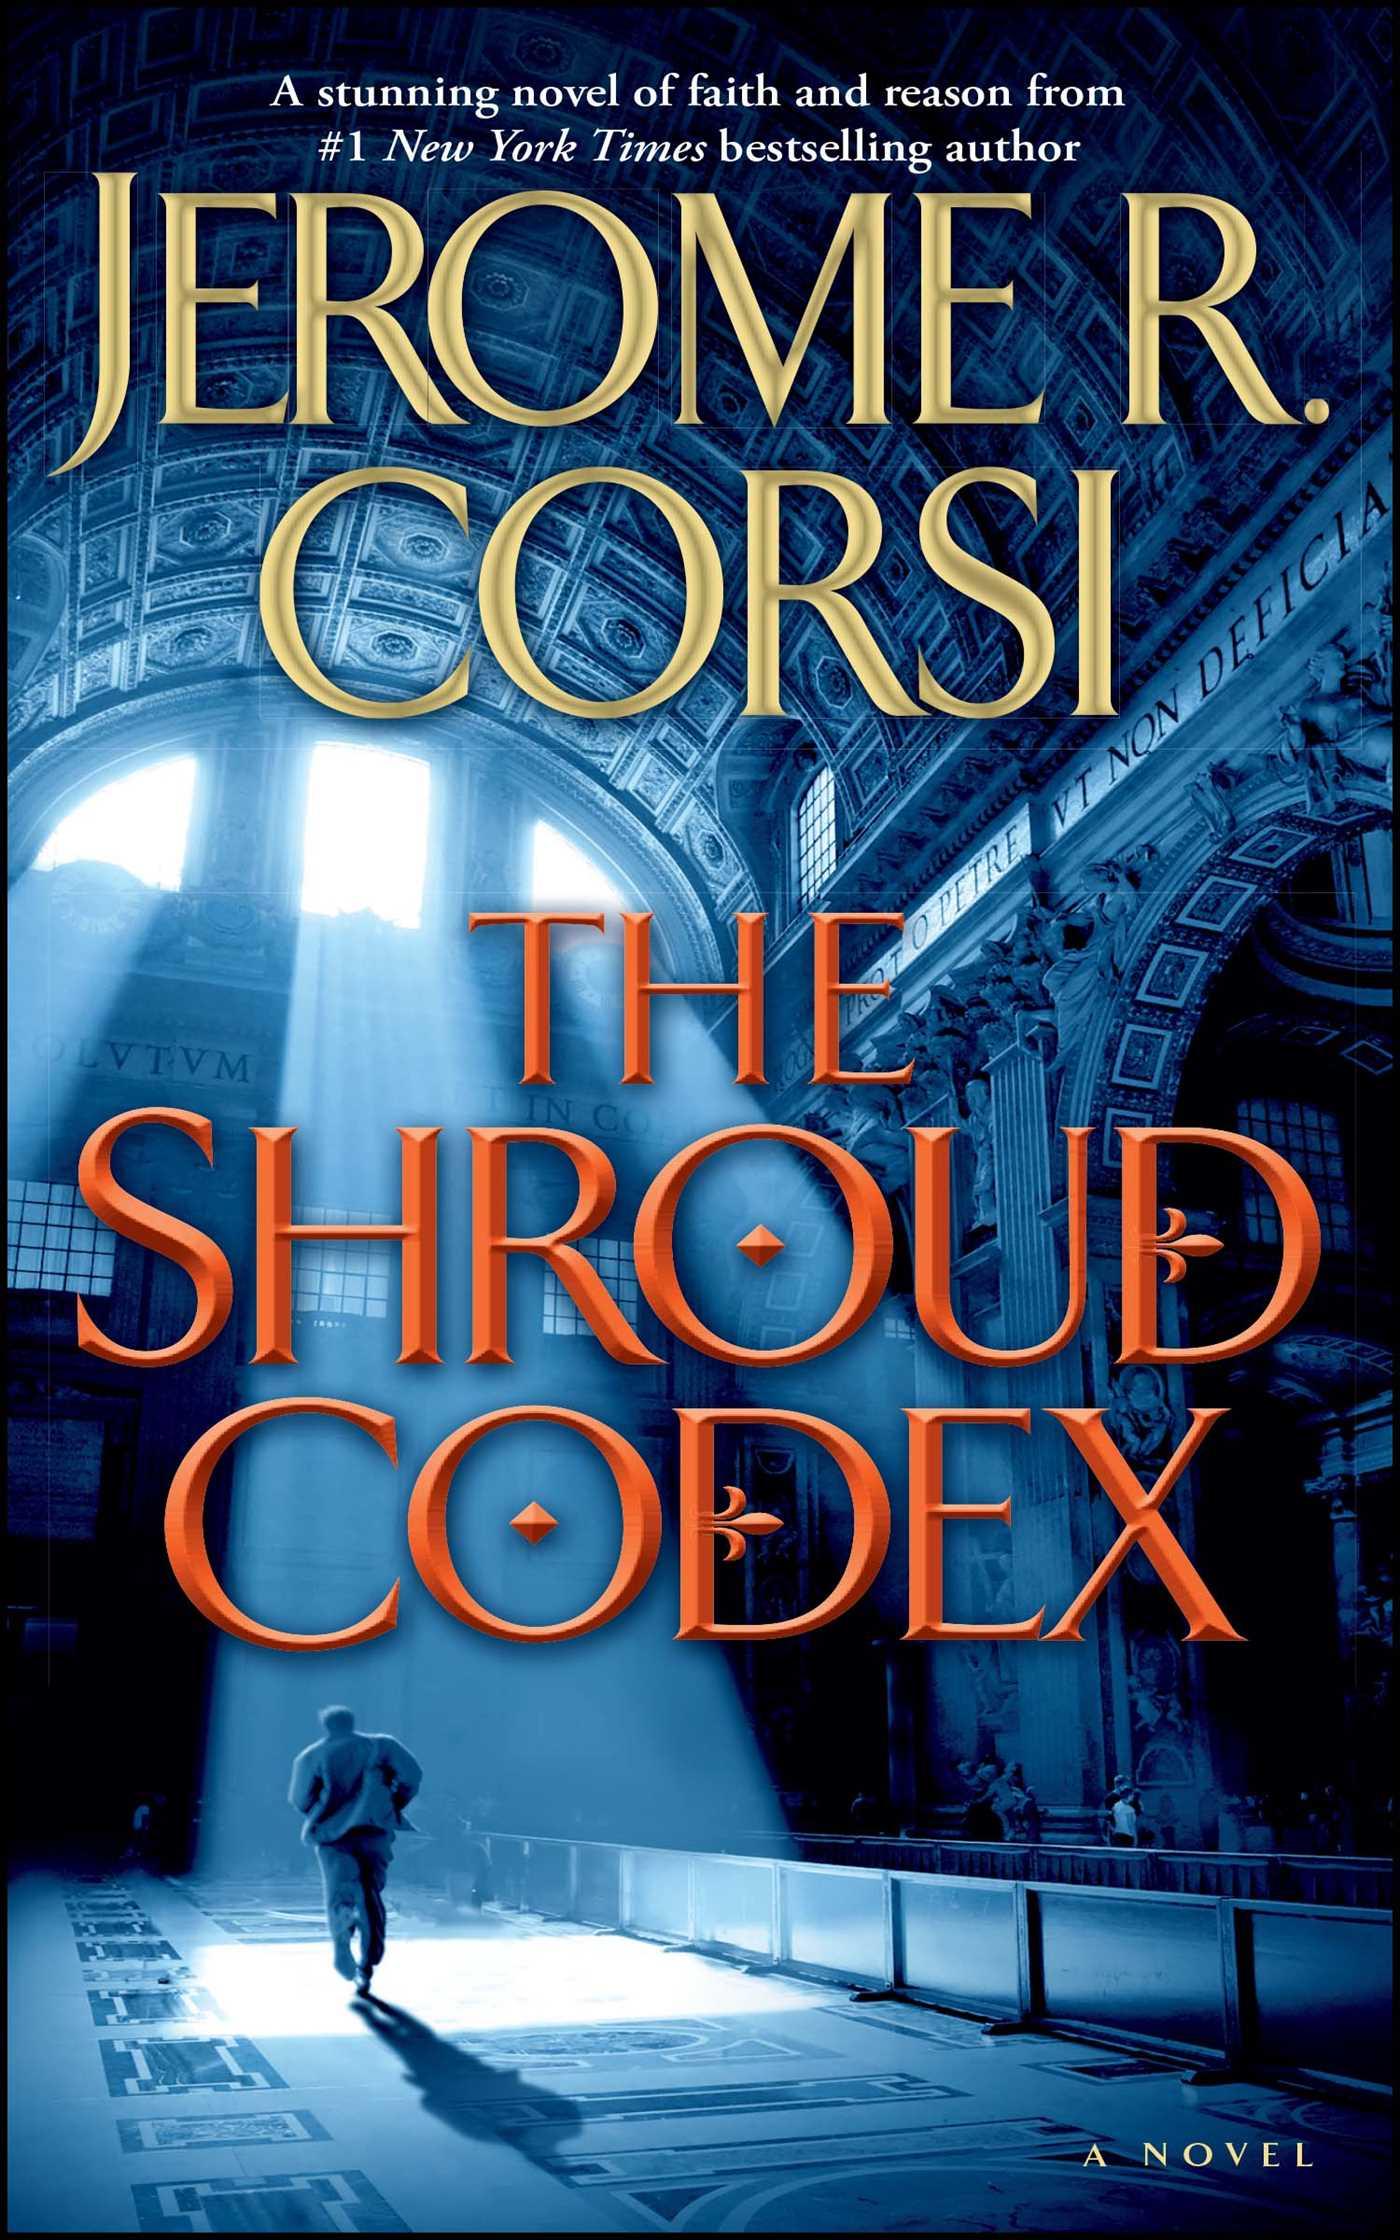 The shroud codex 9781476788296 hr